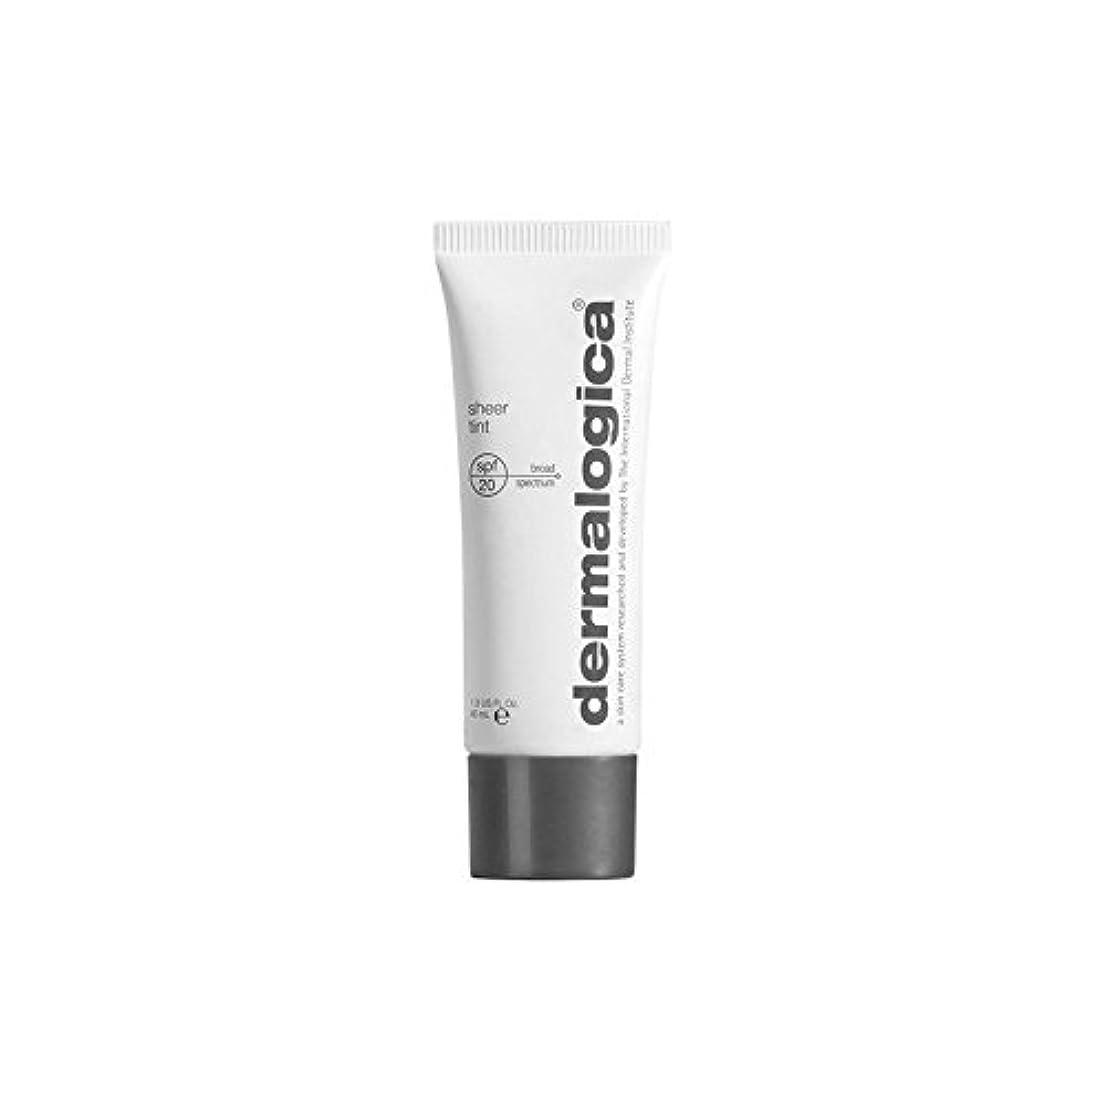 Dermalogica Dark Sheer Tint Moisture (40ml) (Pack of 6) - ダーマロジカ暗い色合い薄手の水分(40ミリリットル) x6 [並行輸入品]